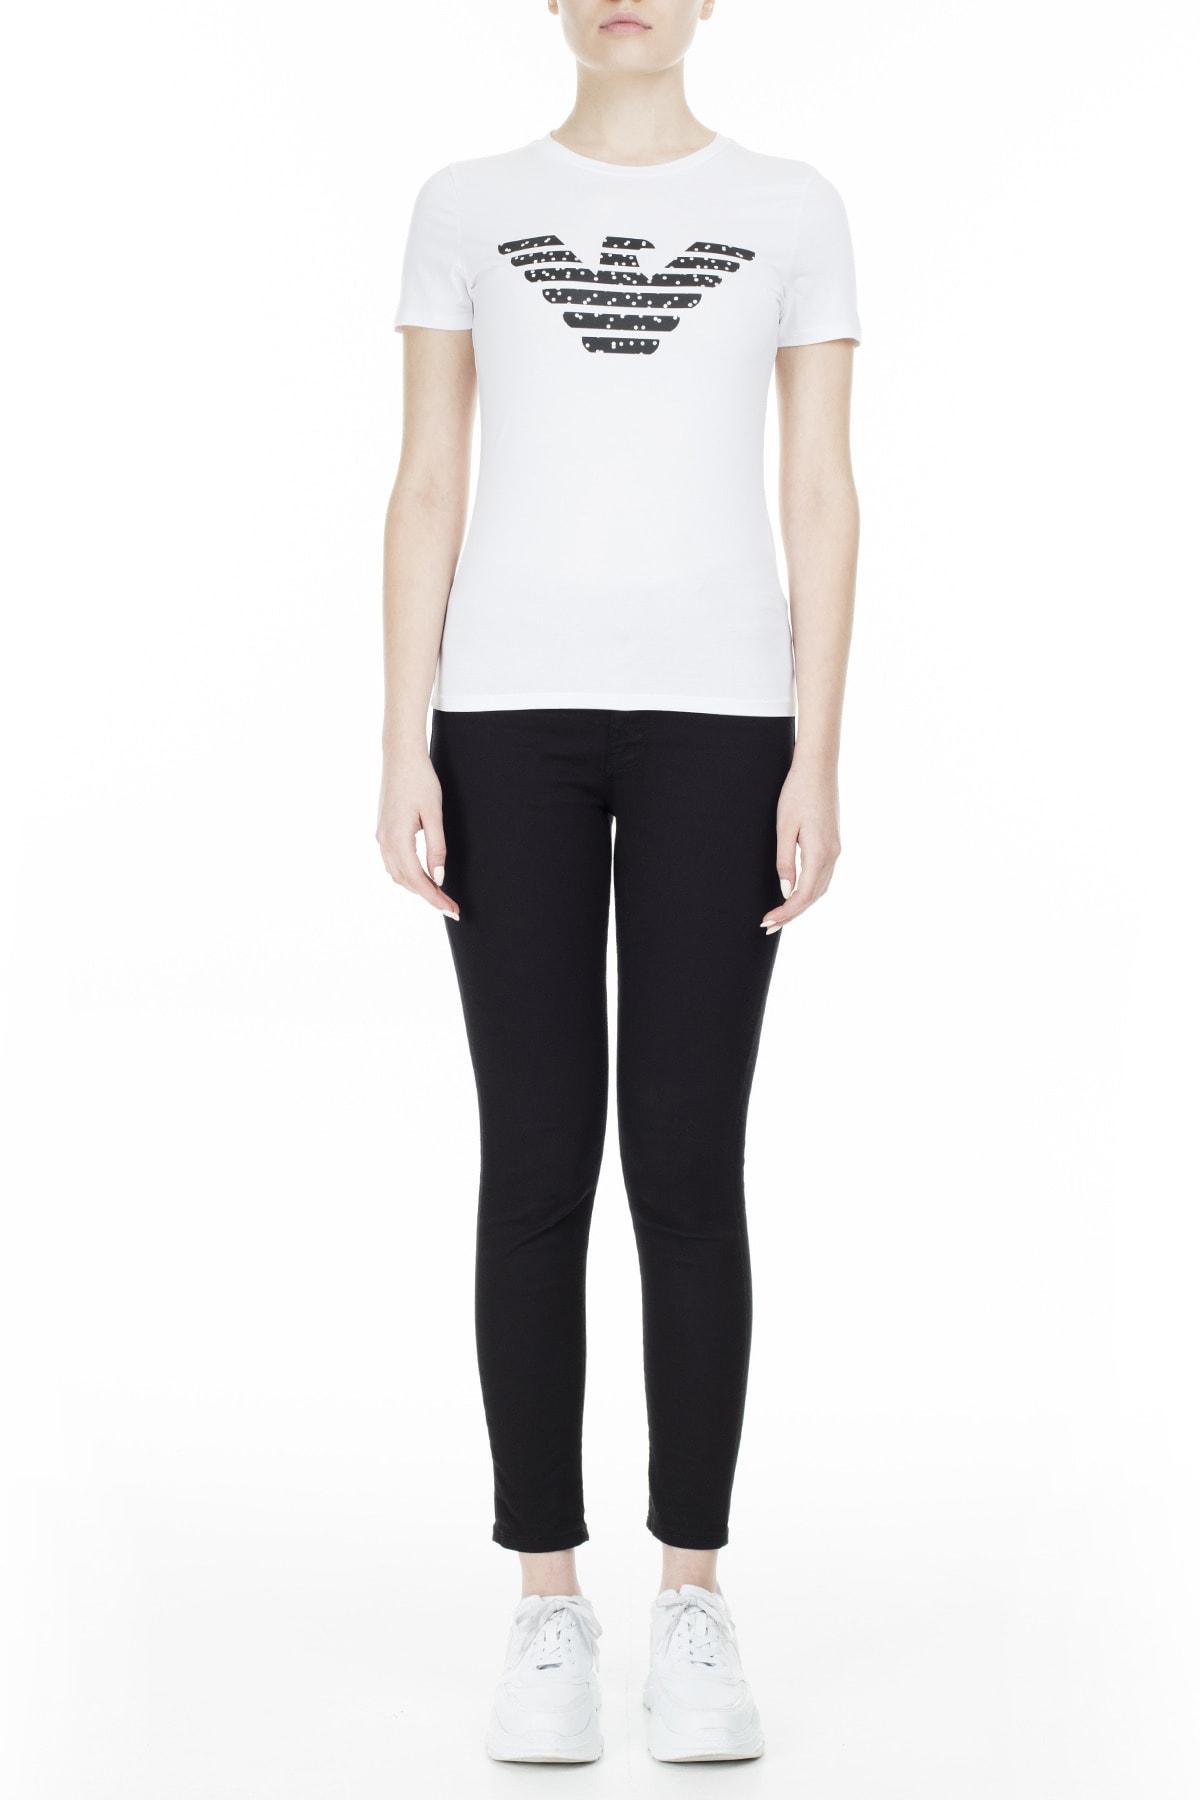 Emporio Armani T Shirt Kadın T Shirt S 6G2T7N 2J07Z 0100 S 6G2T7N 2J07Z 0100 4